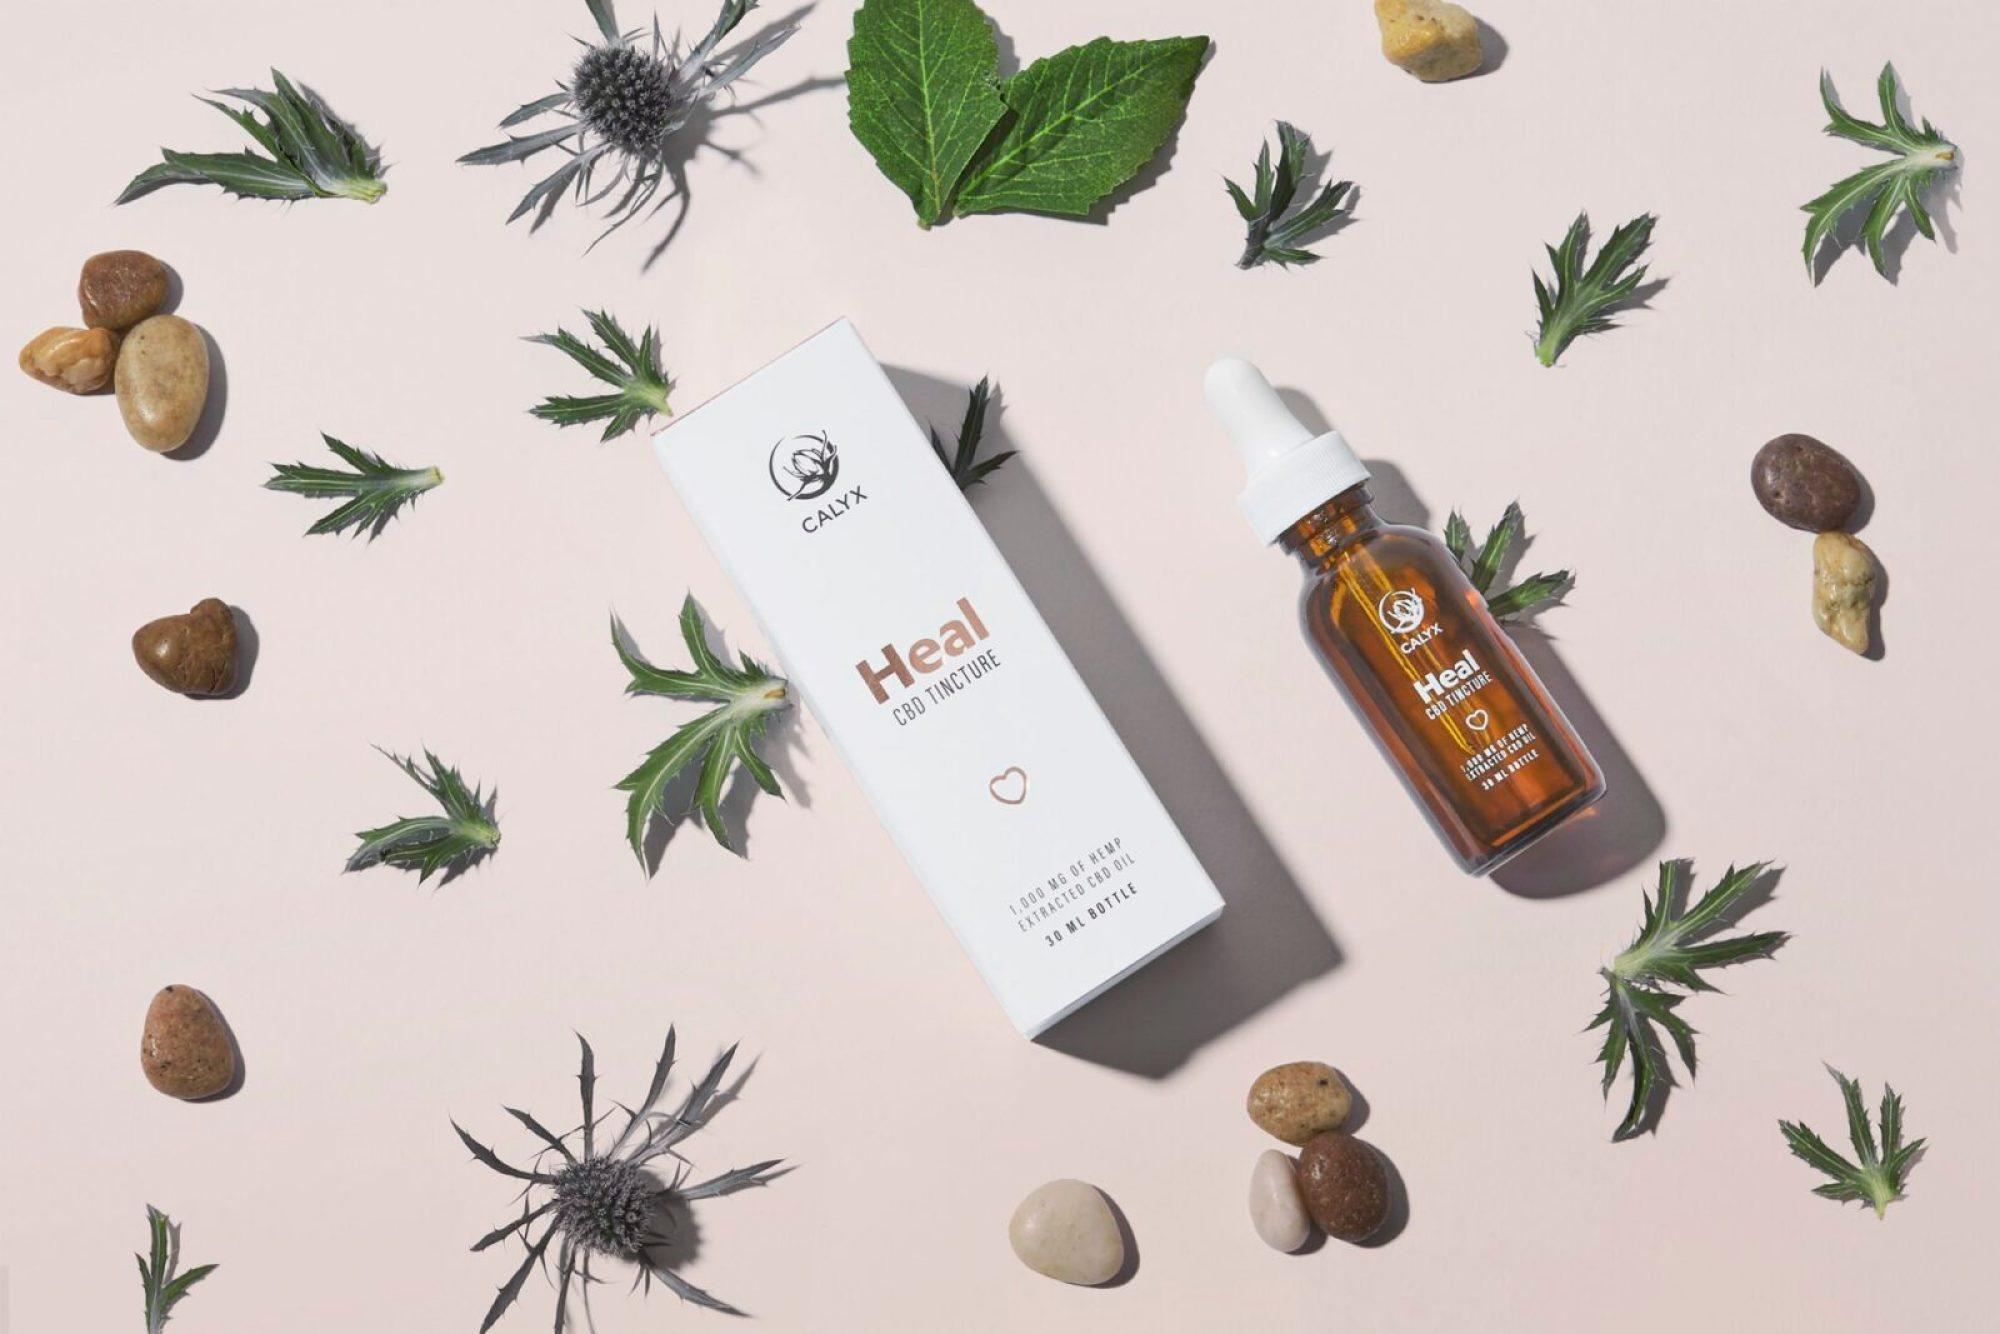 calyx wellness female cannabis brands toronto edit seven 2018